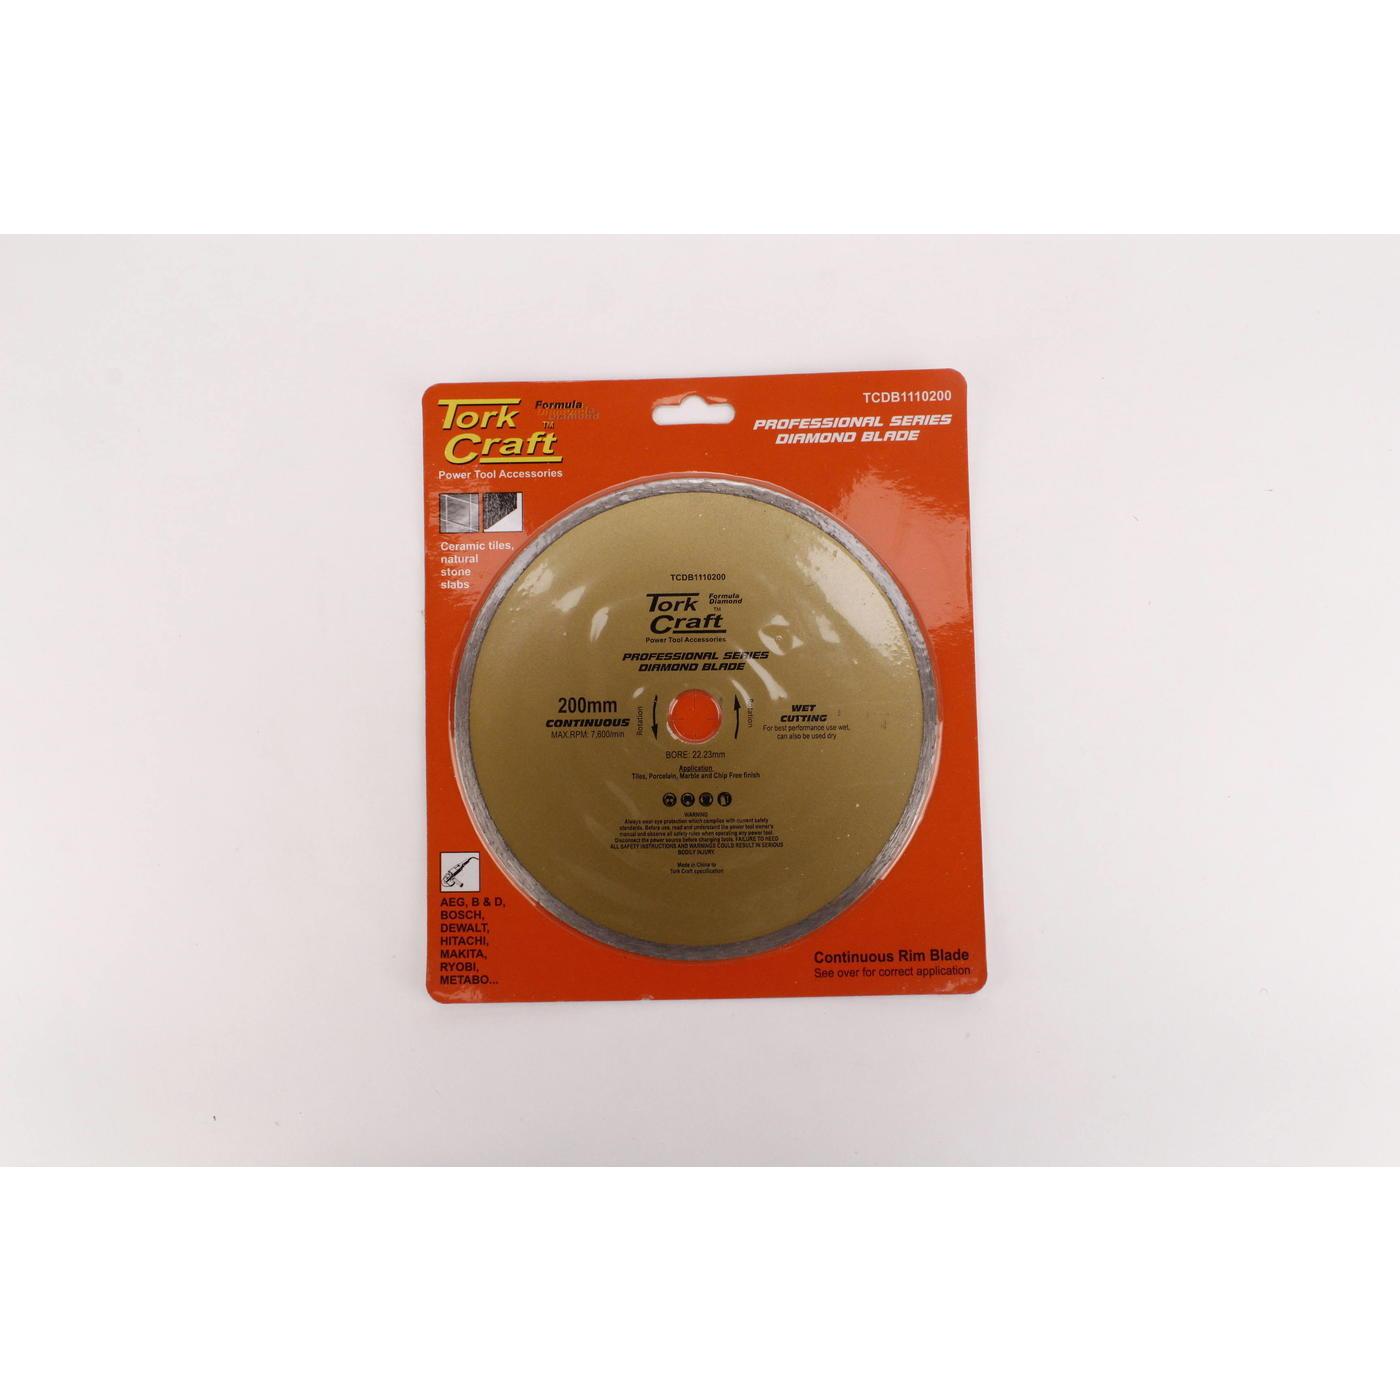 Tork Craft Diamond Bld 200 X 22.22 Cont Rim